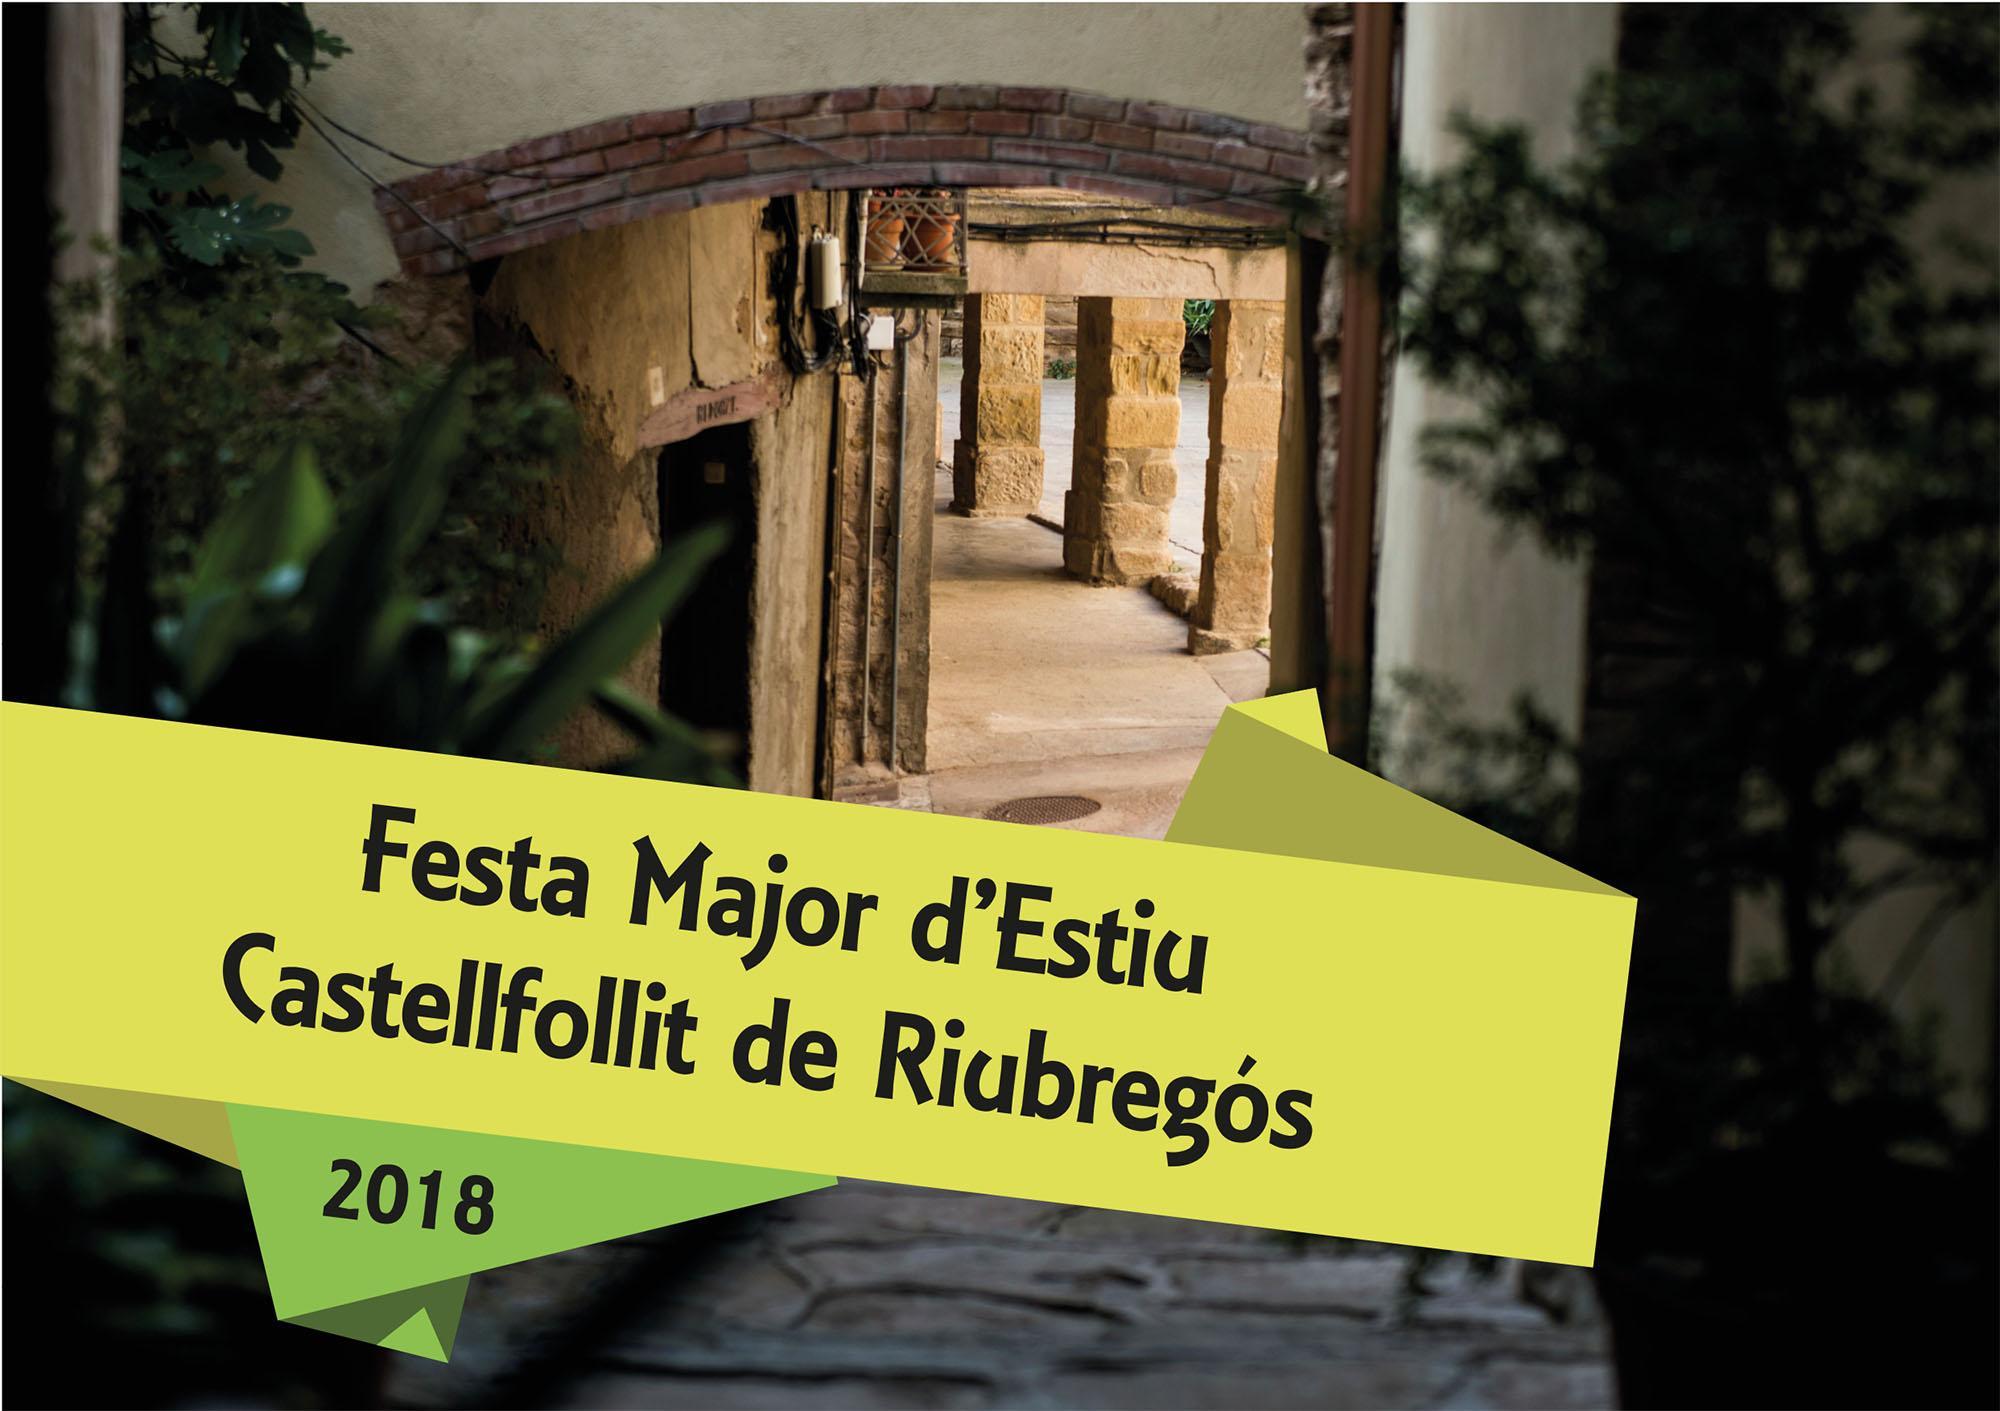 Festa Major d'Estiu de Castellfollit de Riubregós 2018